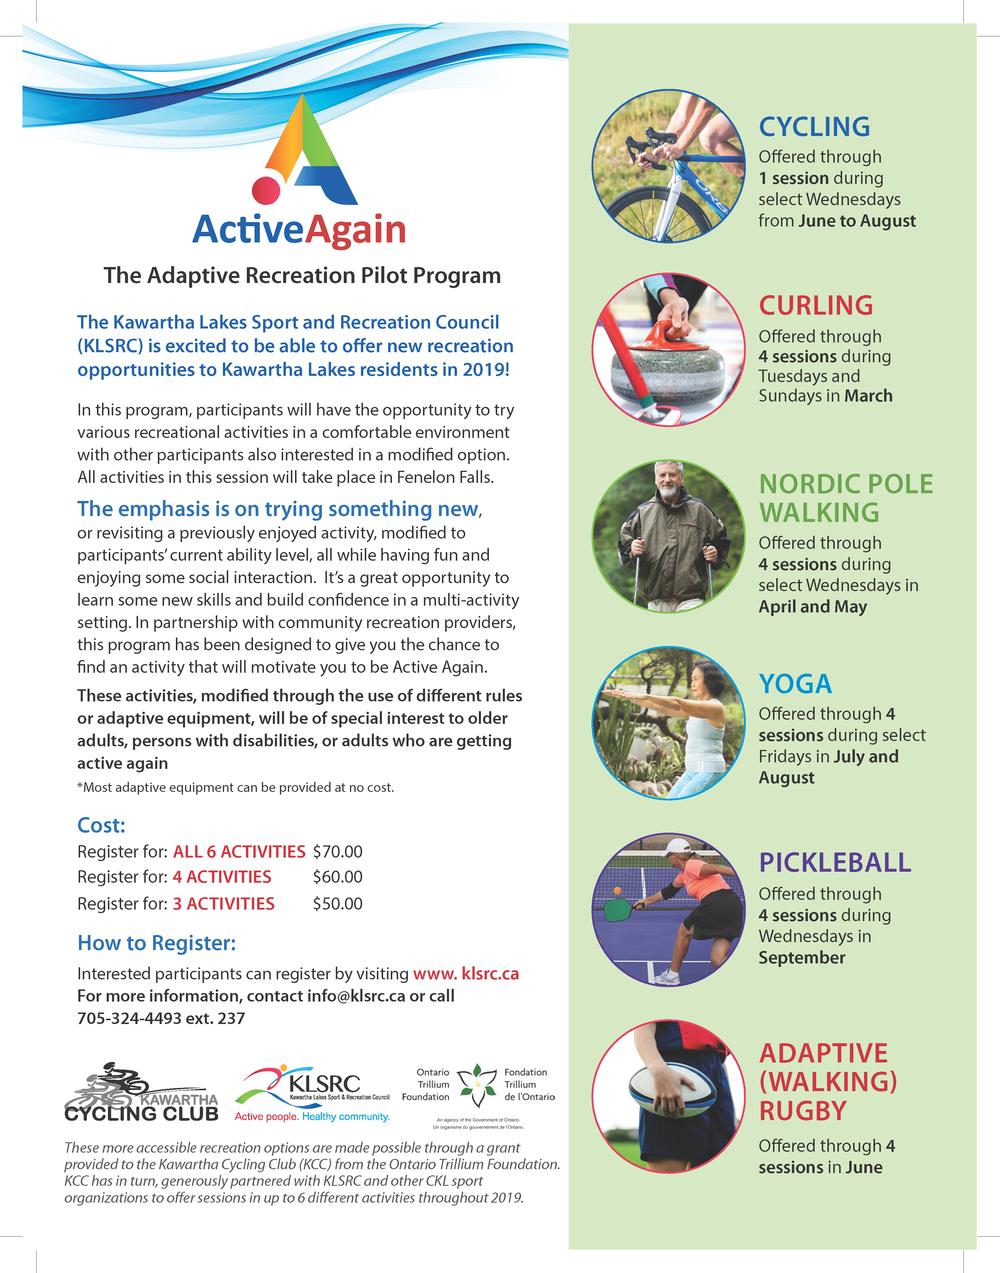 Active Again_Adaptive Recreation Pilot Program 2019.png